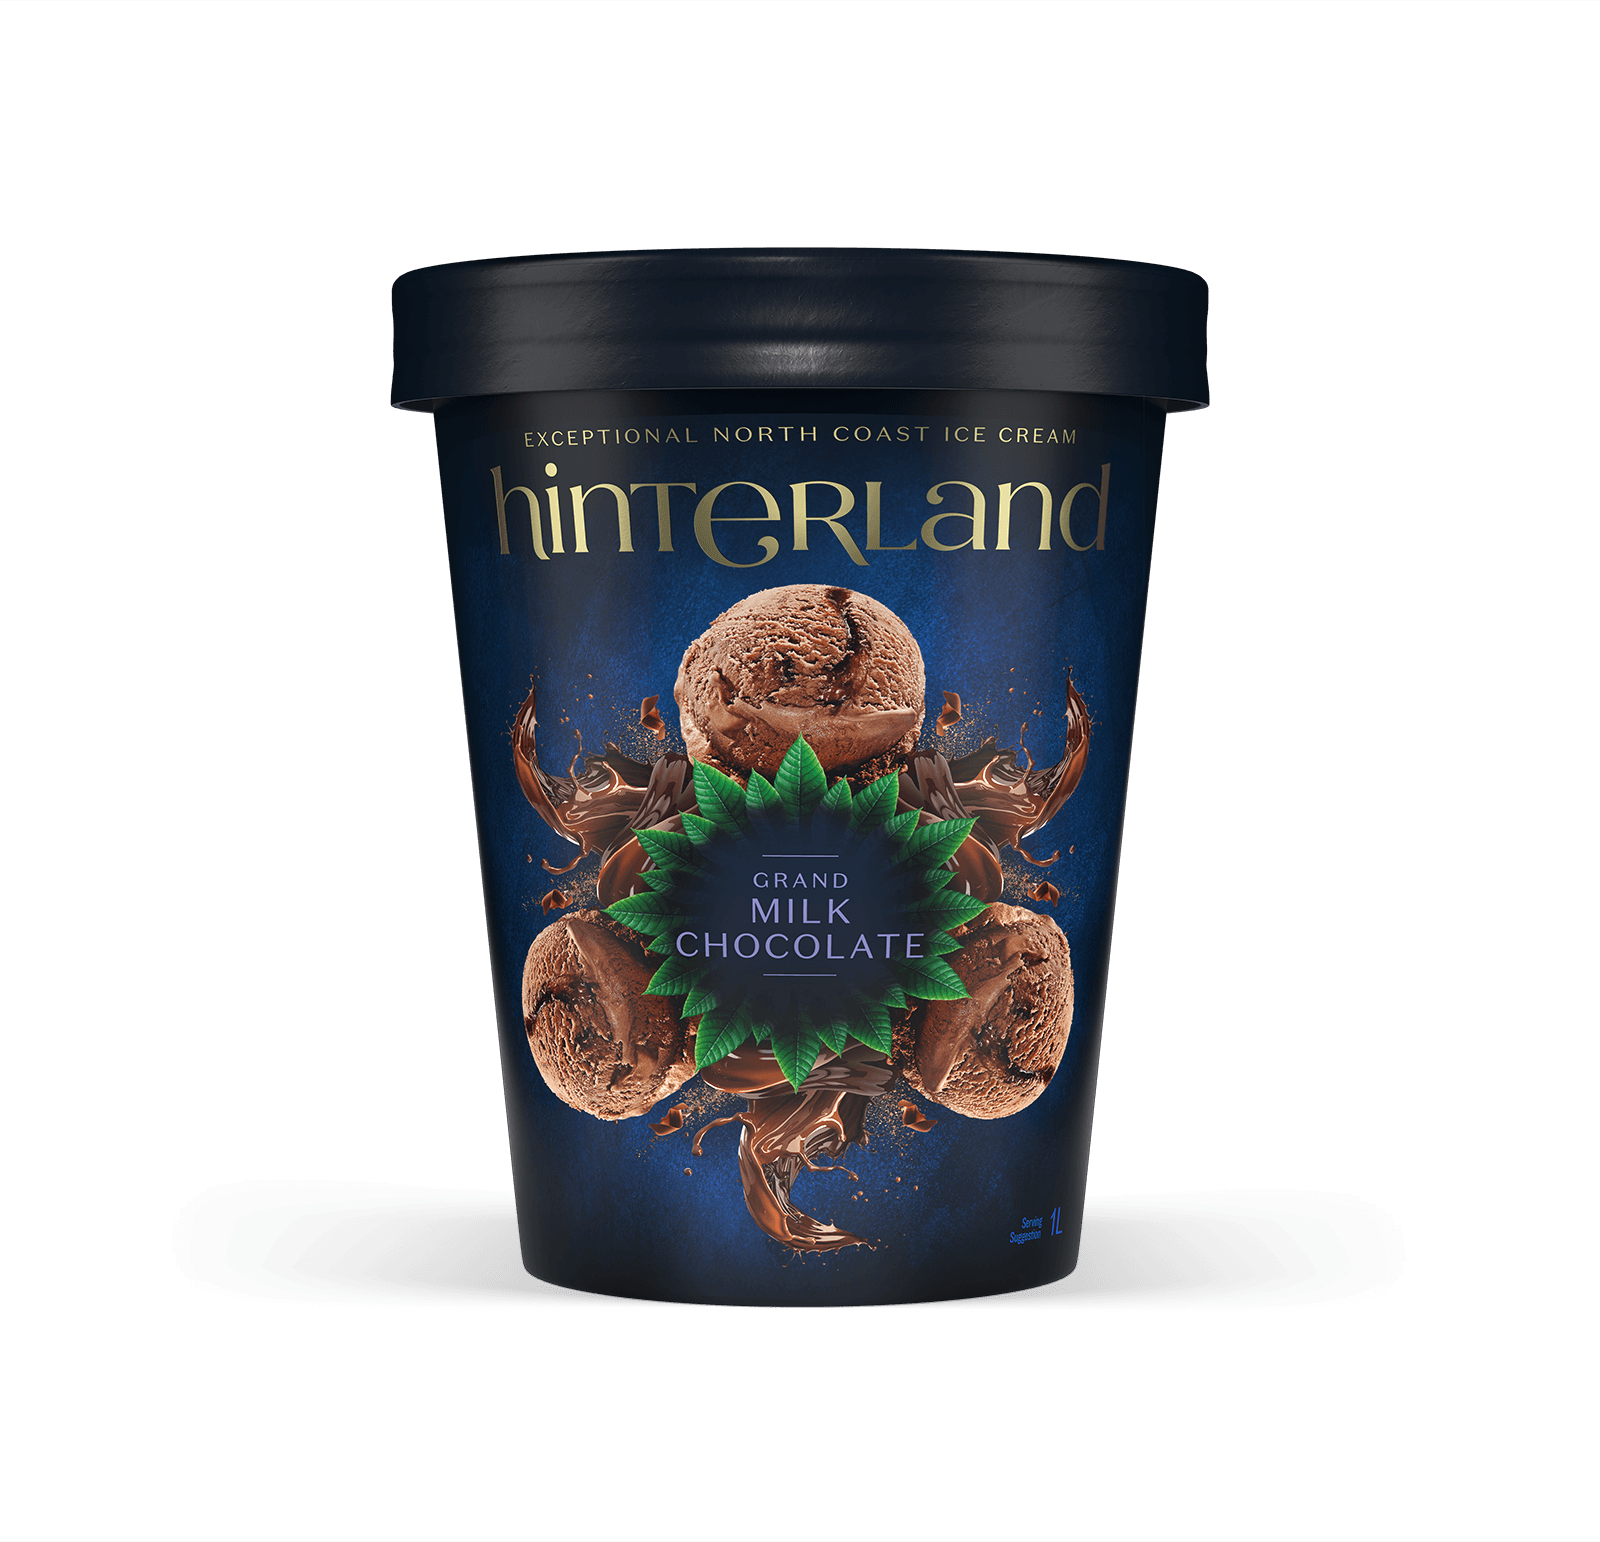 Hinterland Grand Milk Chocolate Ice Cream